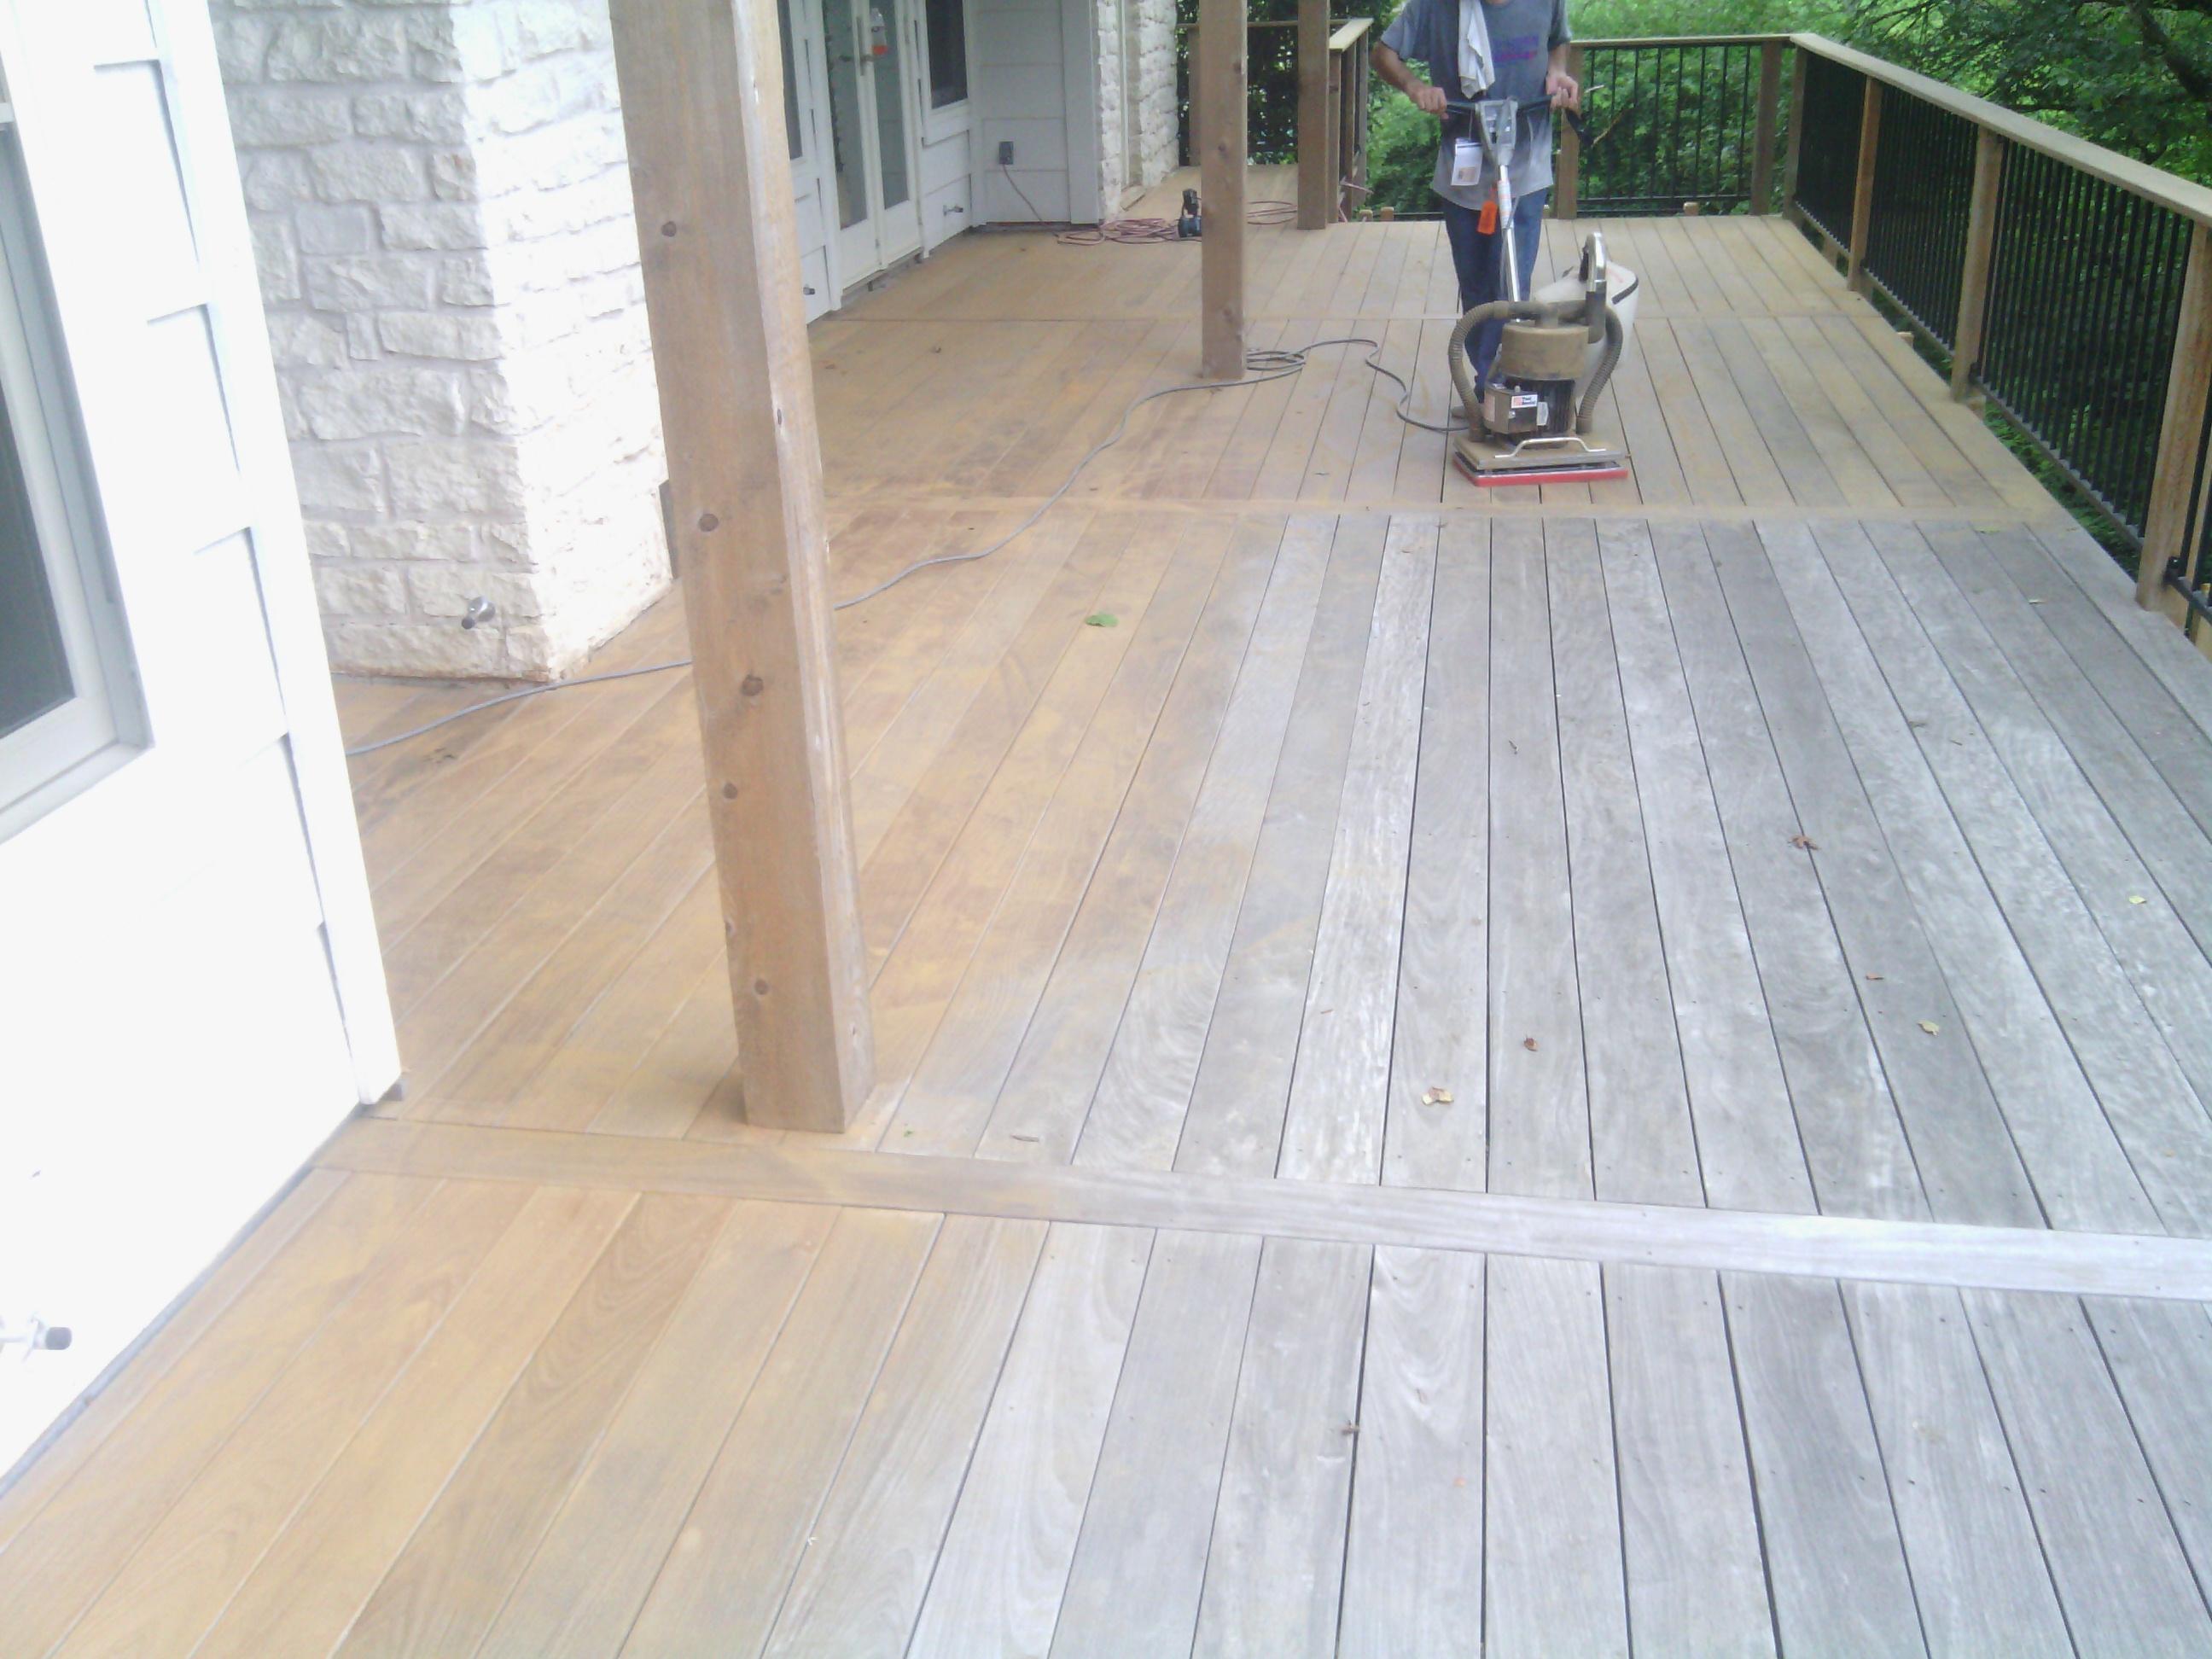 Best Clear Coat Sealant For Ipe Deck Decks Amp Fencing